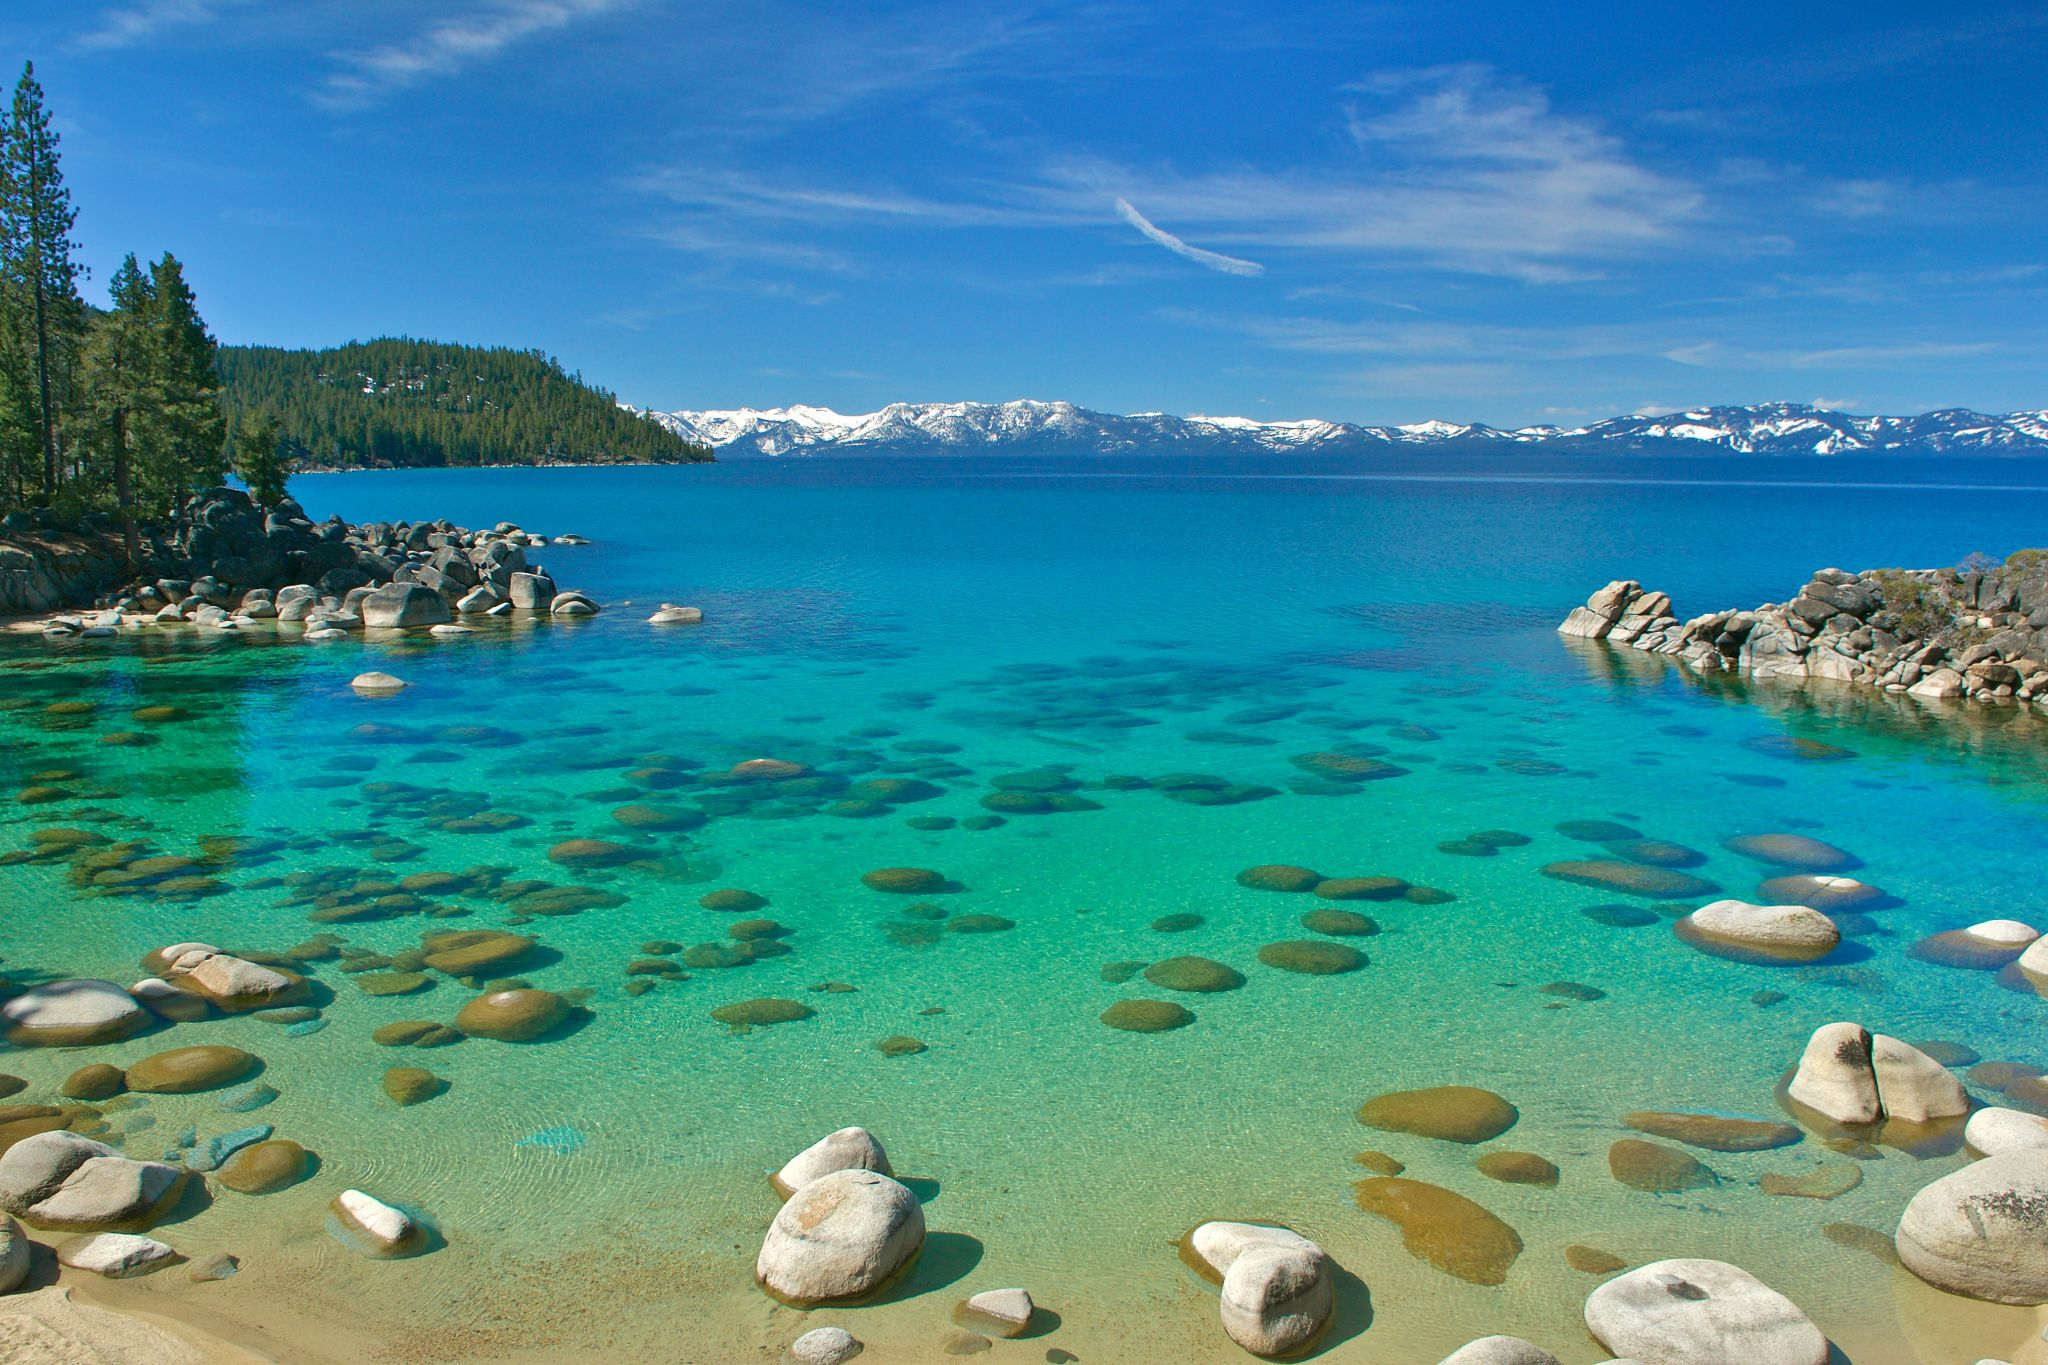 20 super-secret spots around Tahoe: Where to escape the crowds https://t.co/SasfOKABbb https://t.co/khndi2F6X5